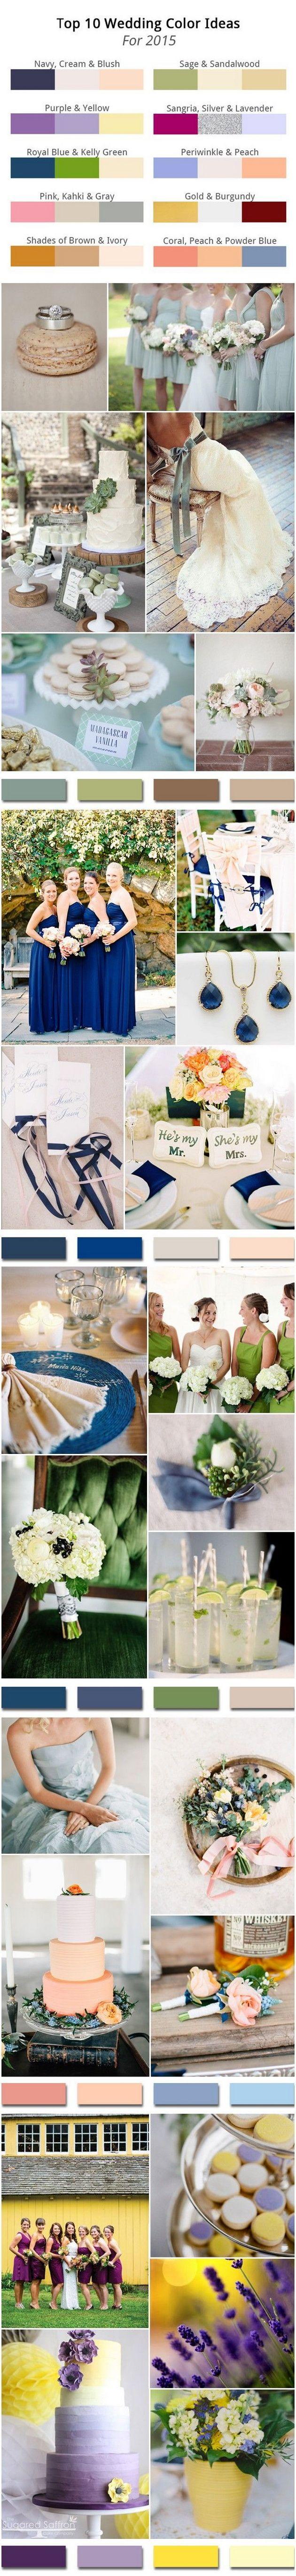 Top 10 Wedding Color Ideas for 2015